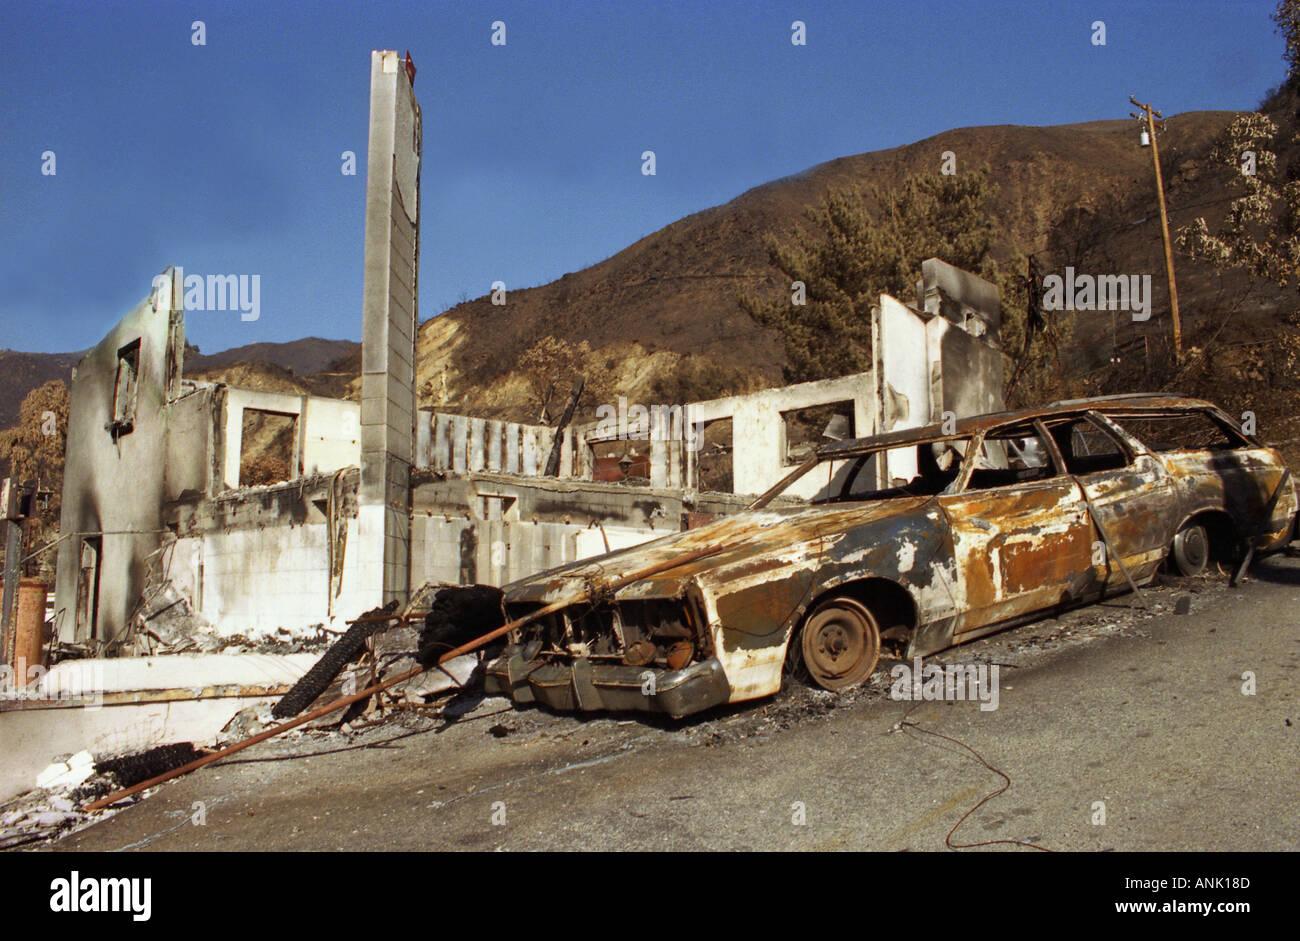 Fire Forest Fires Malibu Burnt Out Car Jaguar 1993 Califorian Hollywood  Hills Los Angeles L A La Disaster Fire Smoke Flames